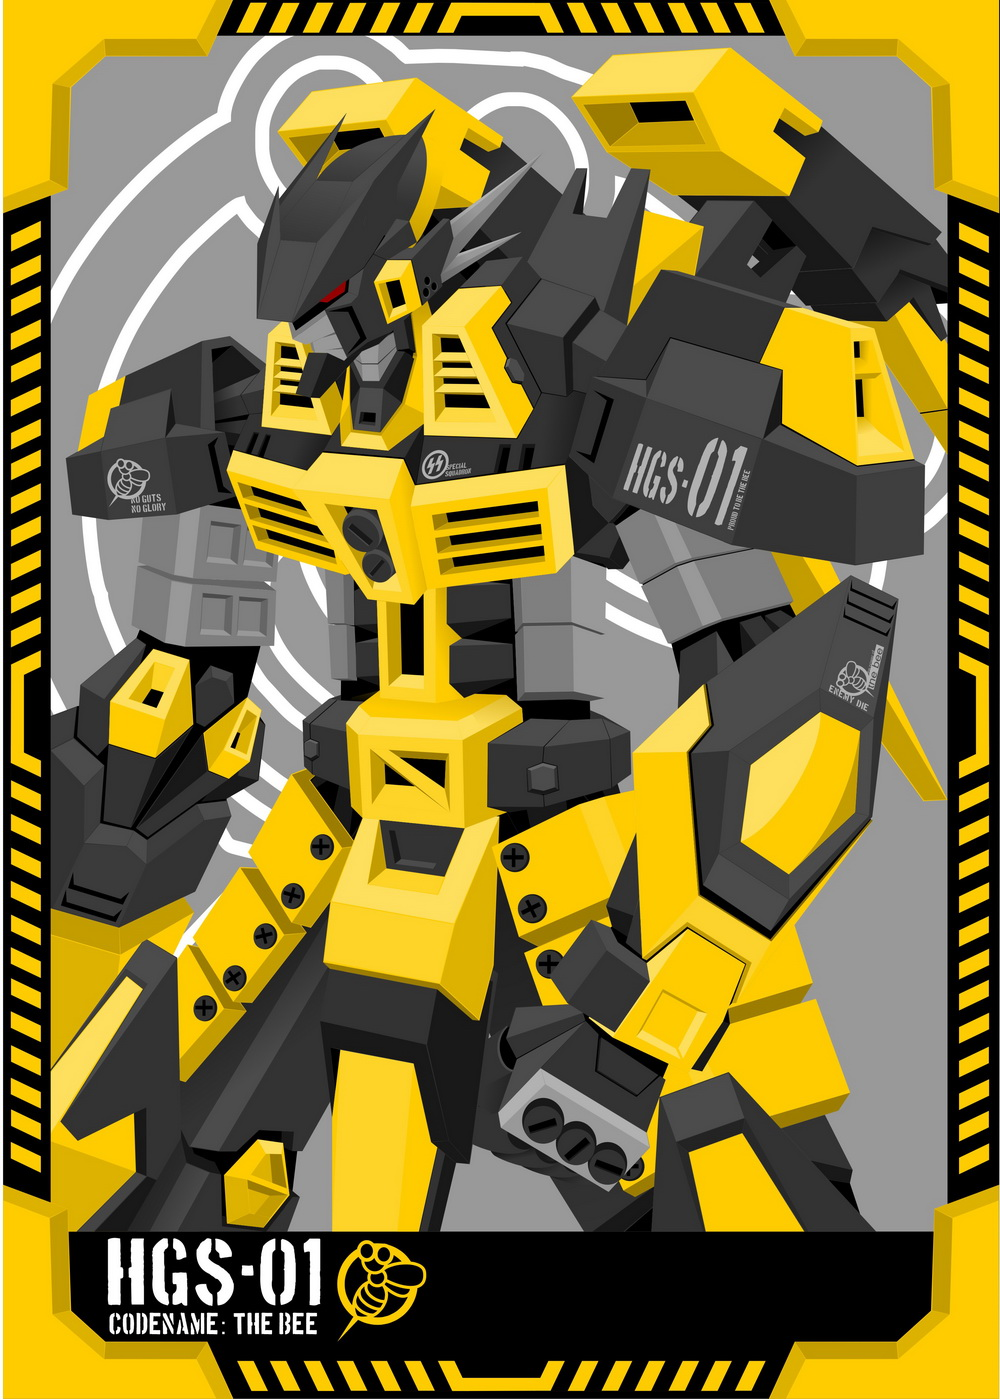 Codename: The Bee